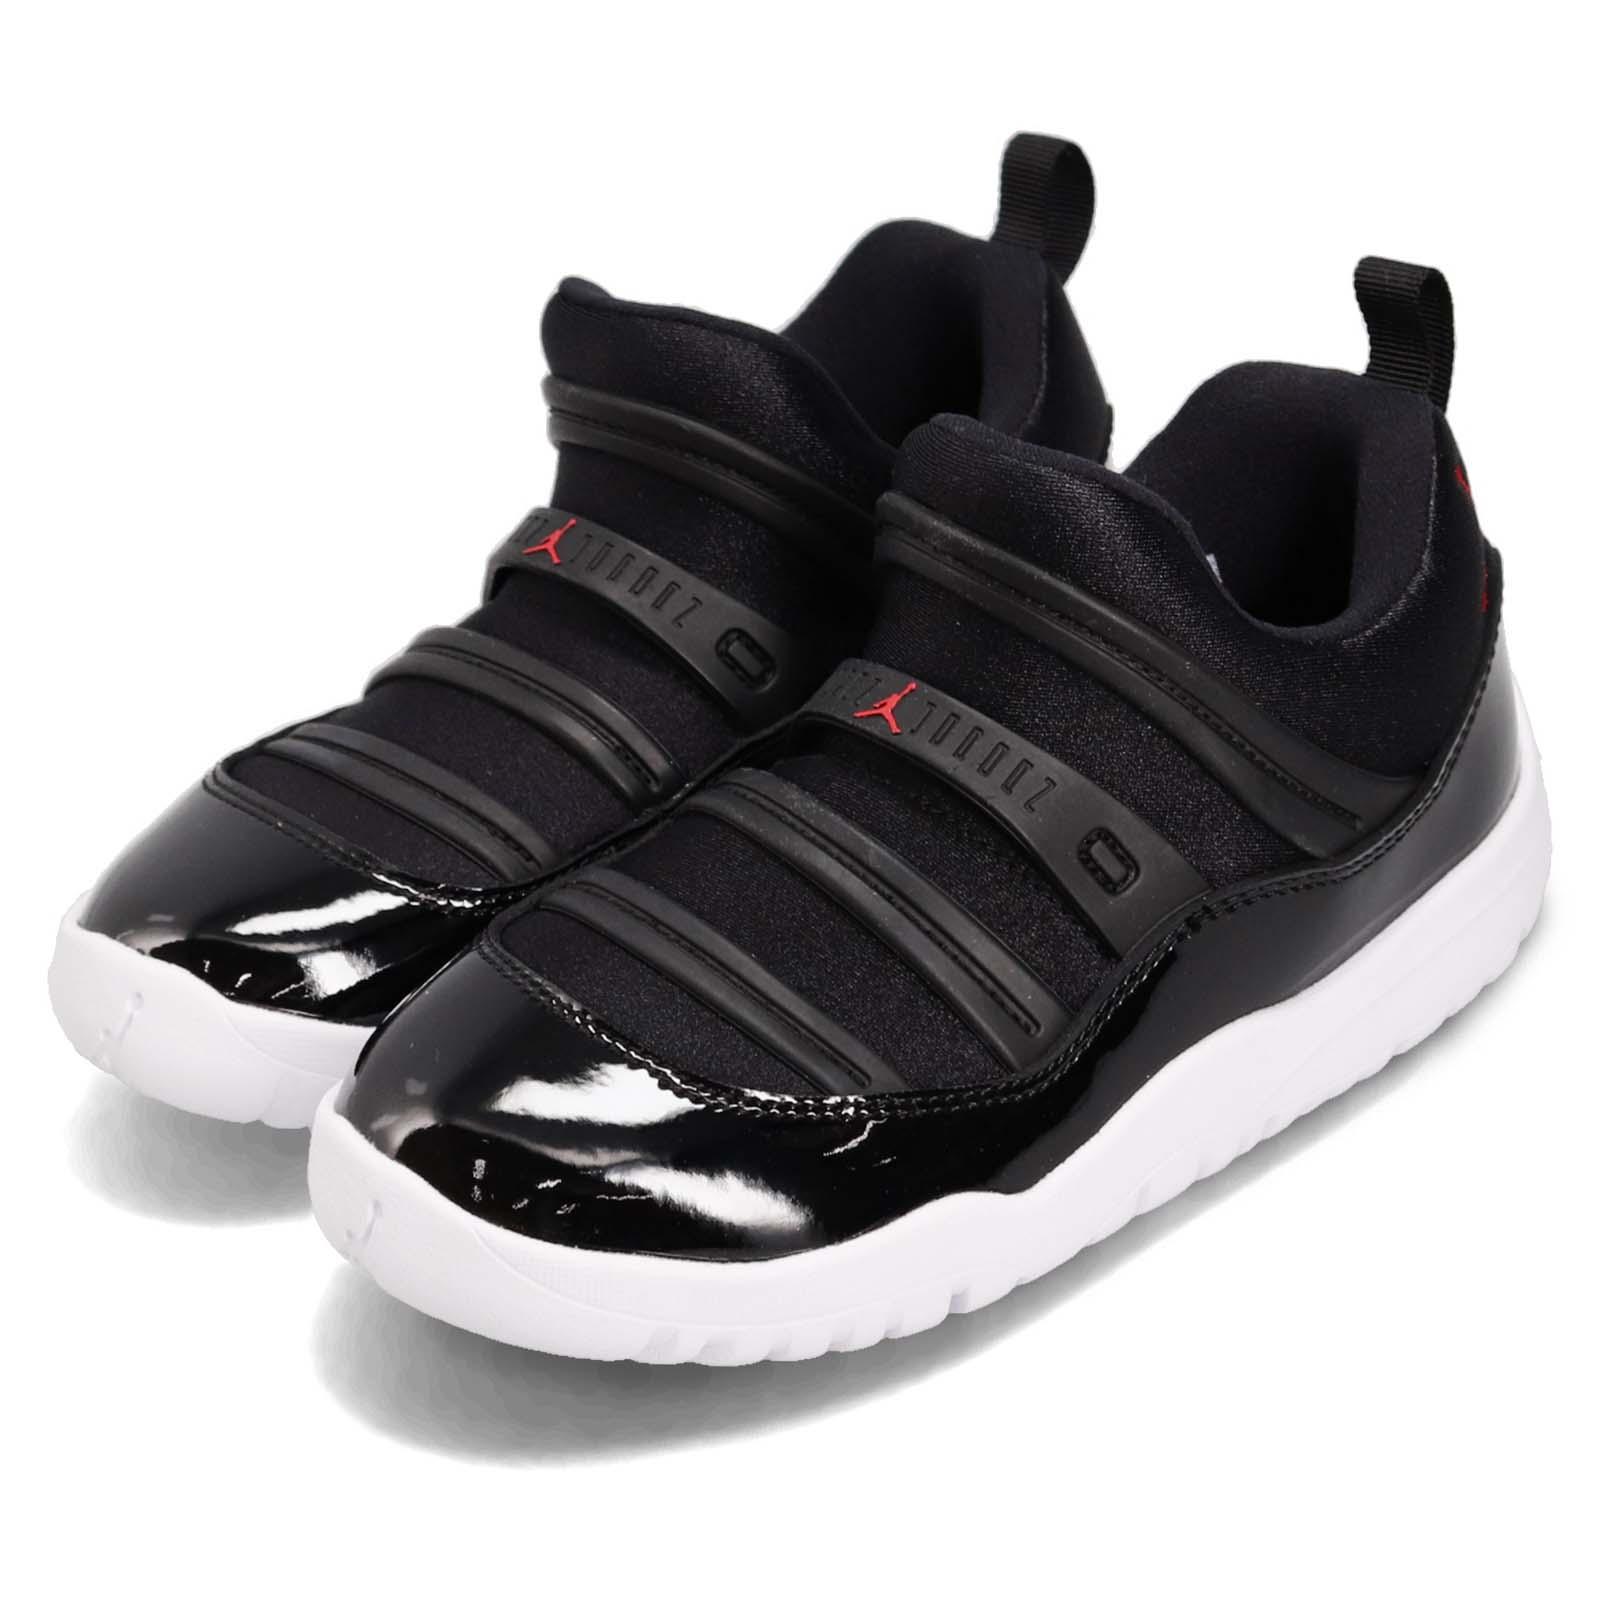 Nike 籃球鞋 Jordan 11 Retro 運動 童鞋 BQ7101-002